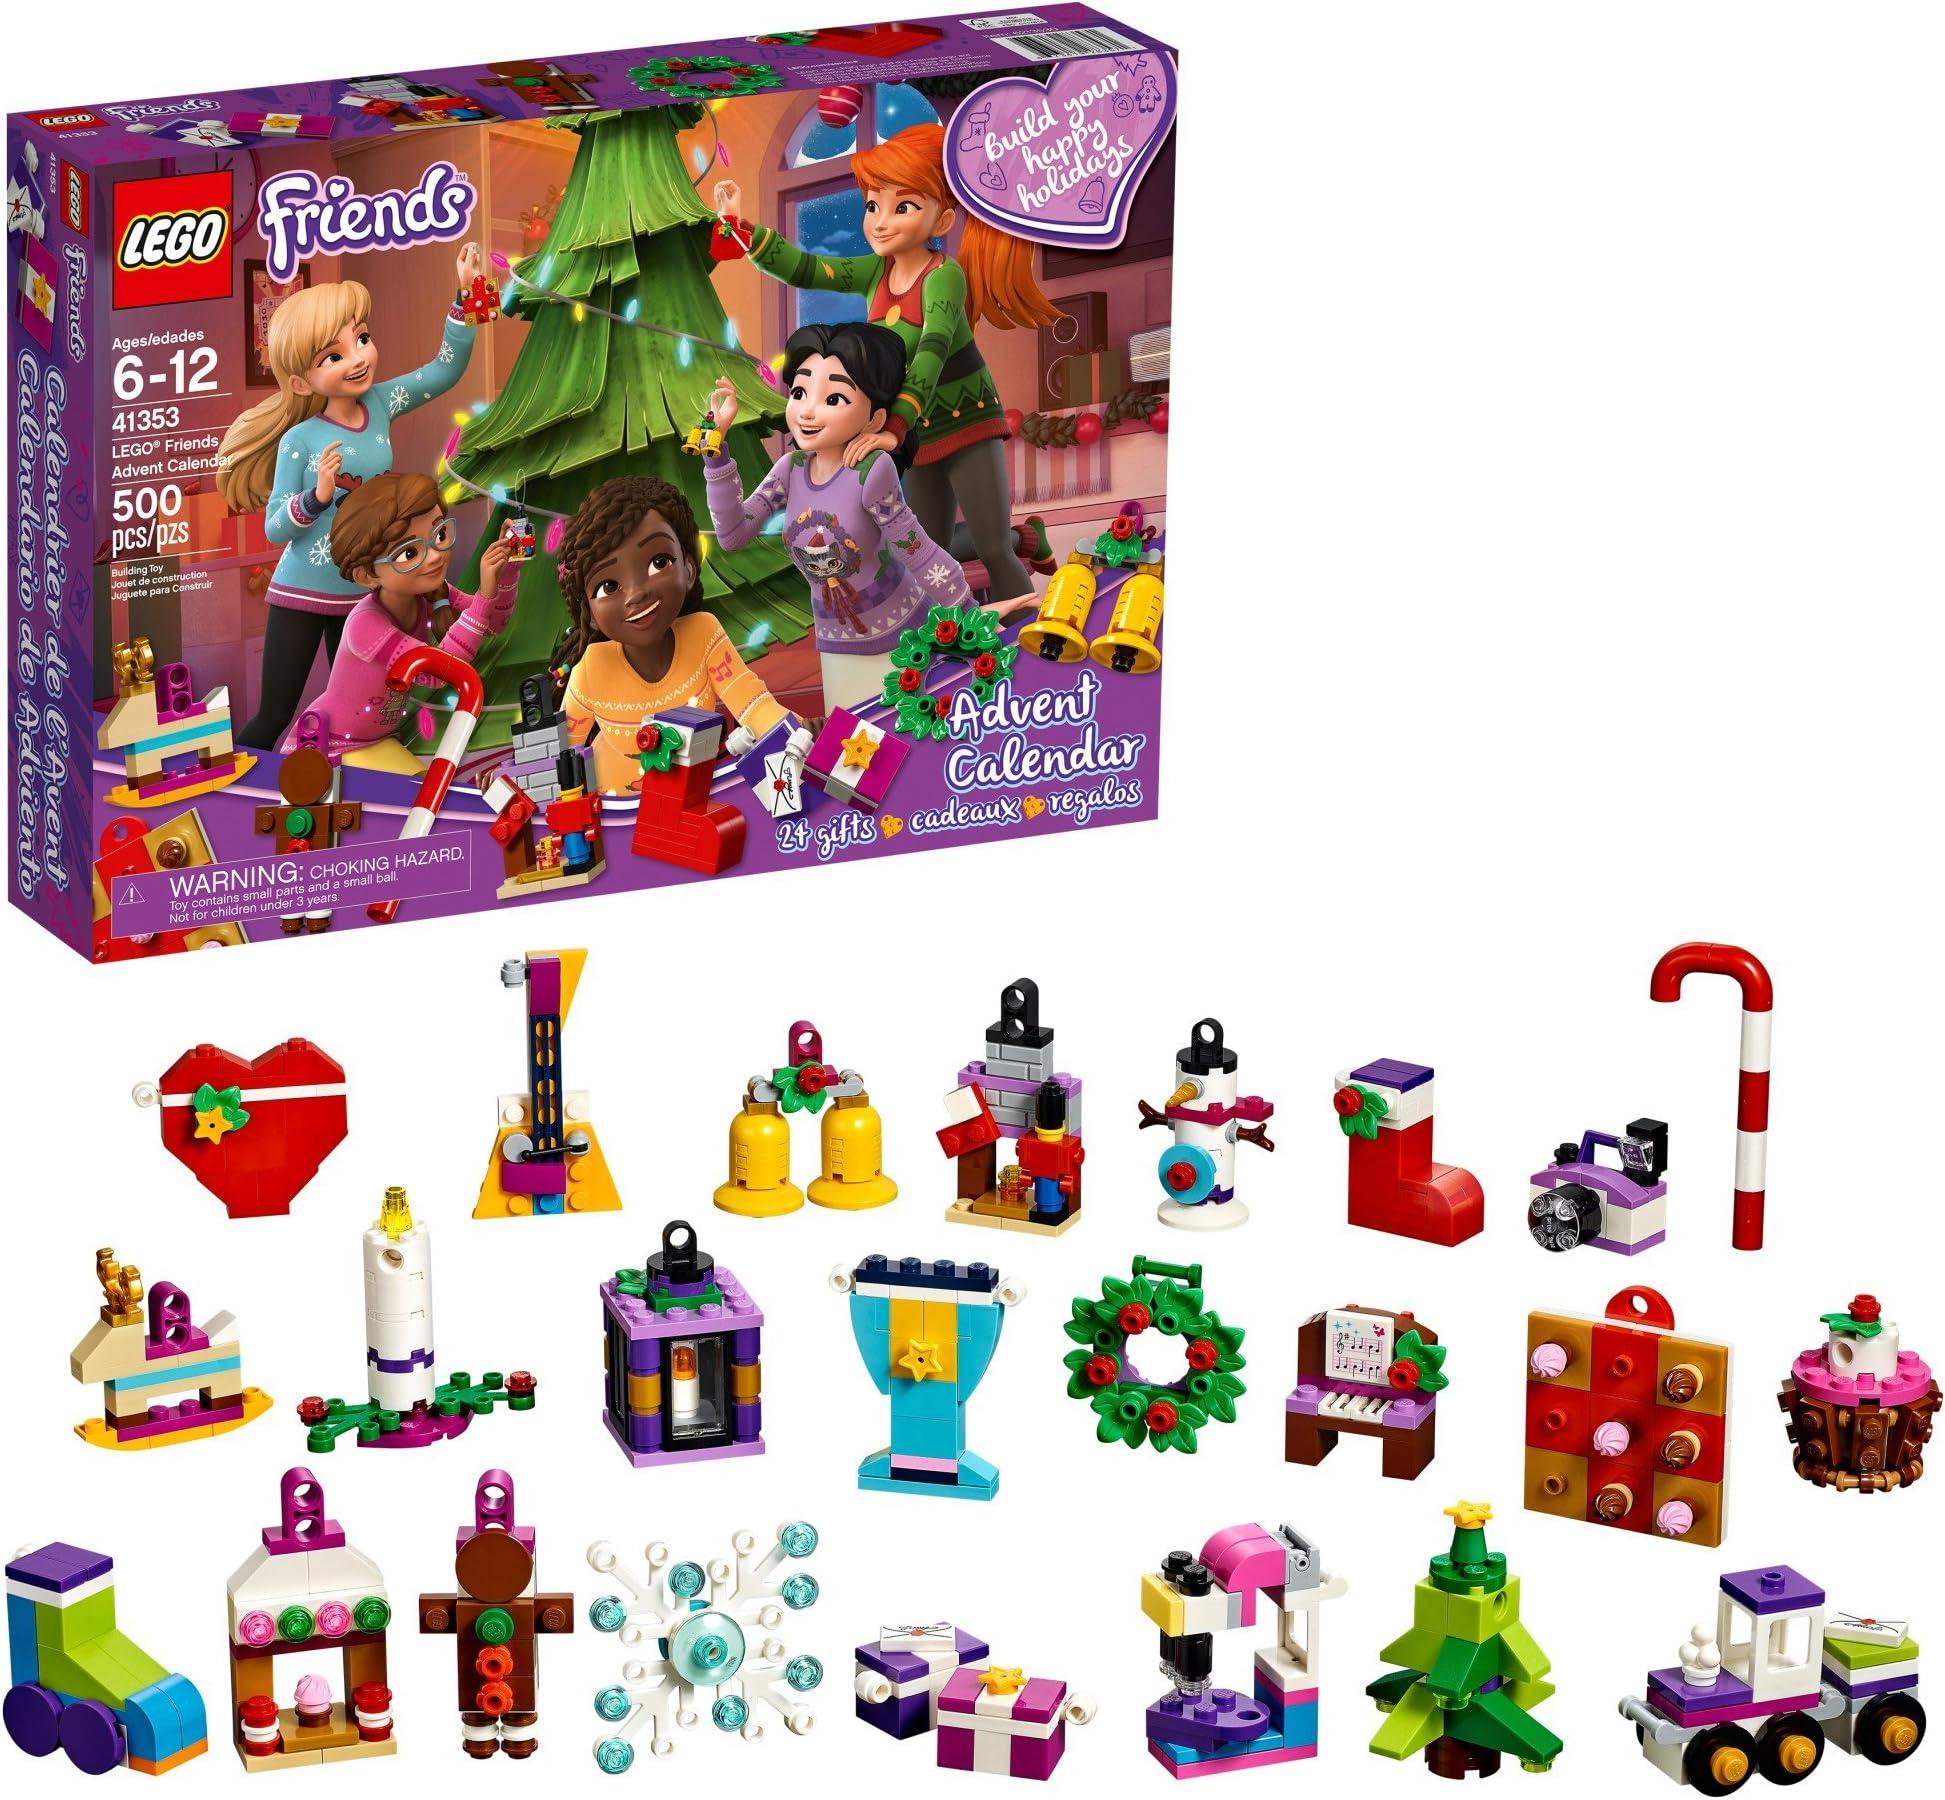 Lego October 2022 Calendar.Lego Friends Advent Calendar New 41382 Lego Building Toys Toys Hobbies